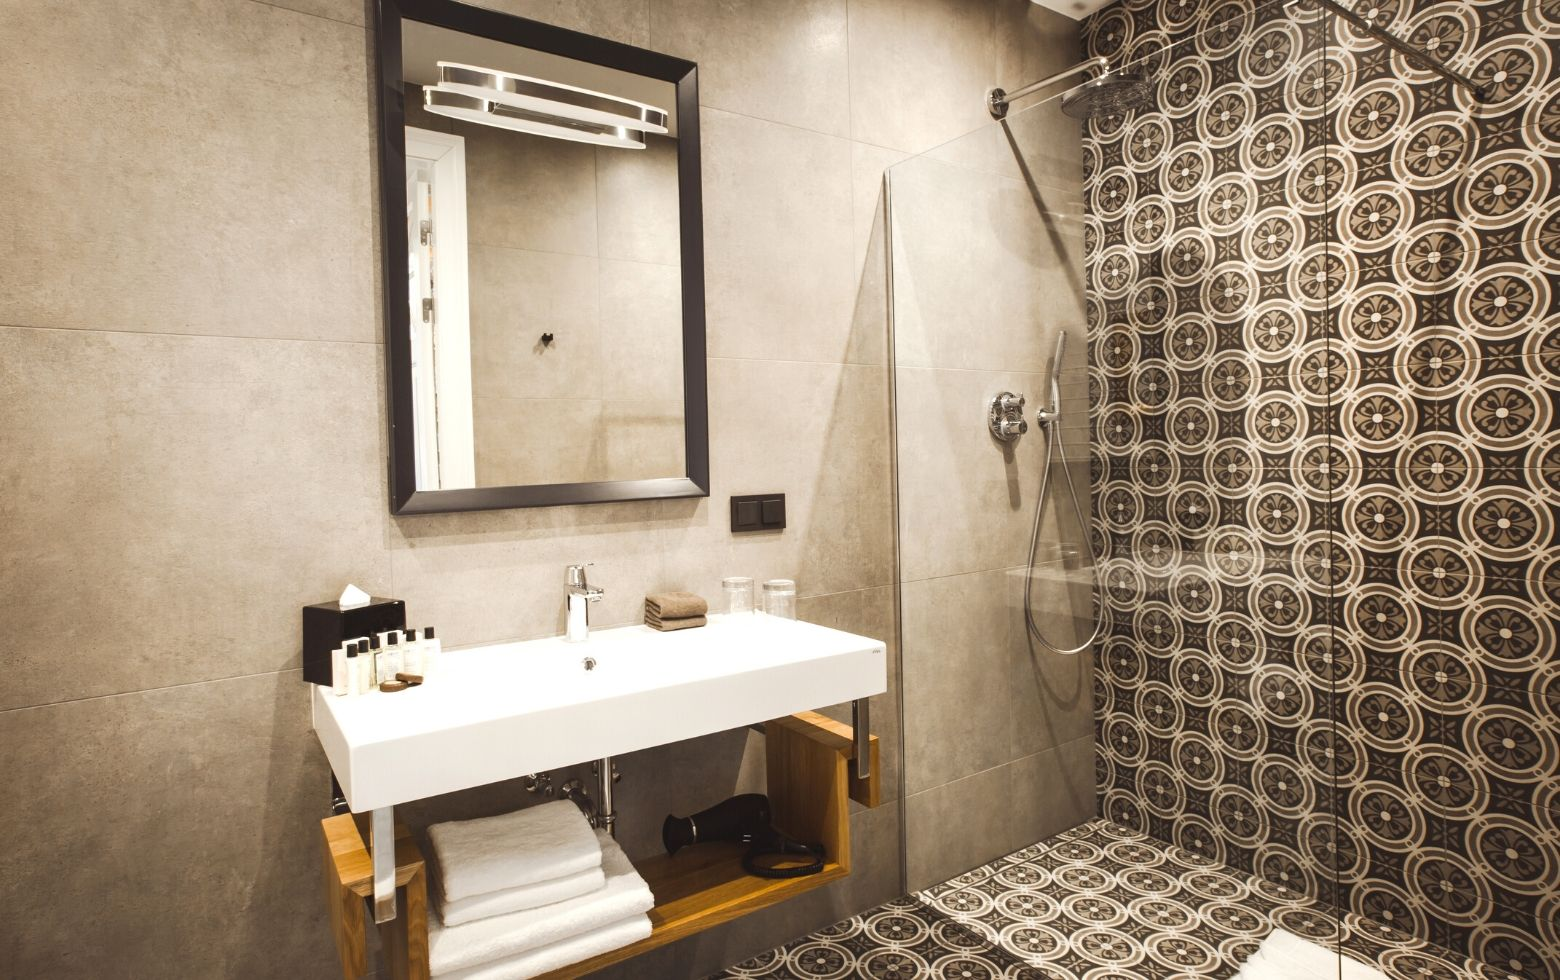 gospa-viesnicas-gal-art-hotel-roma2